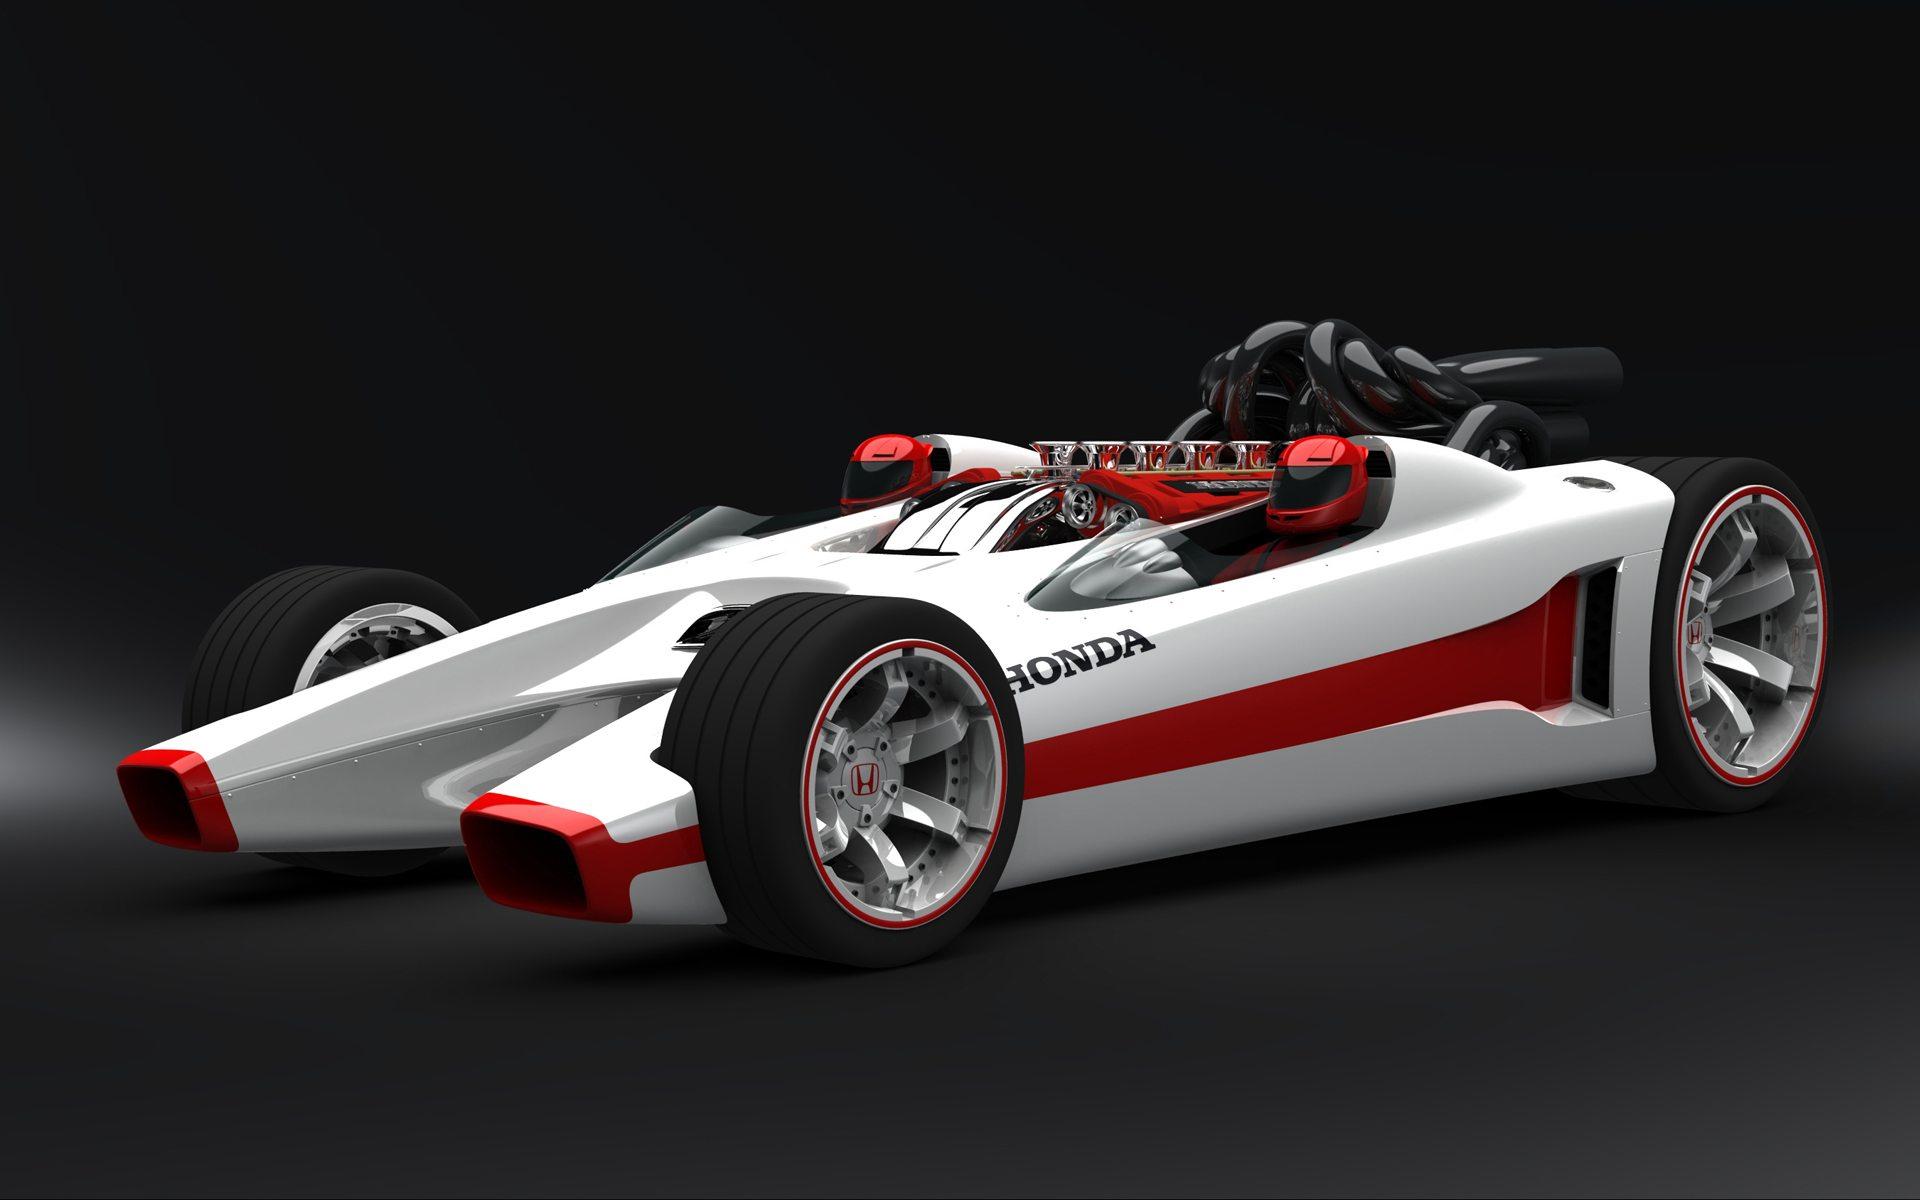 Hot Wheels Honda Racer - HD Wallpaper